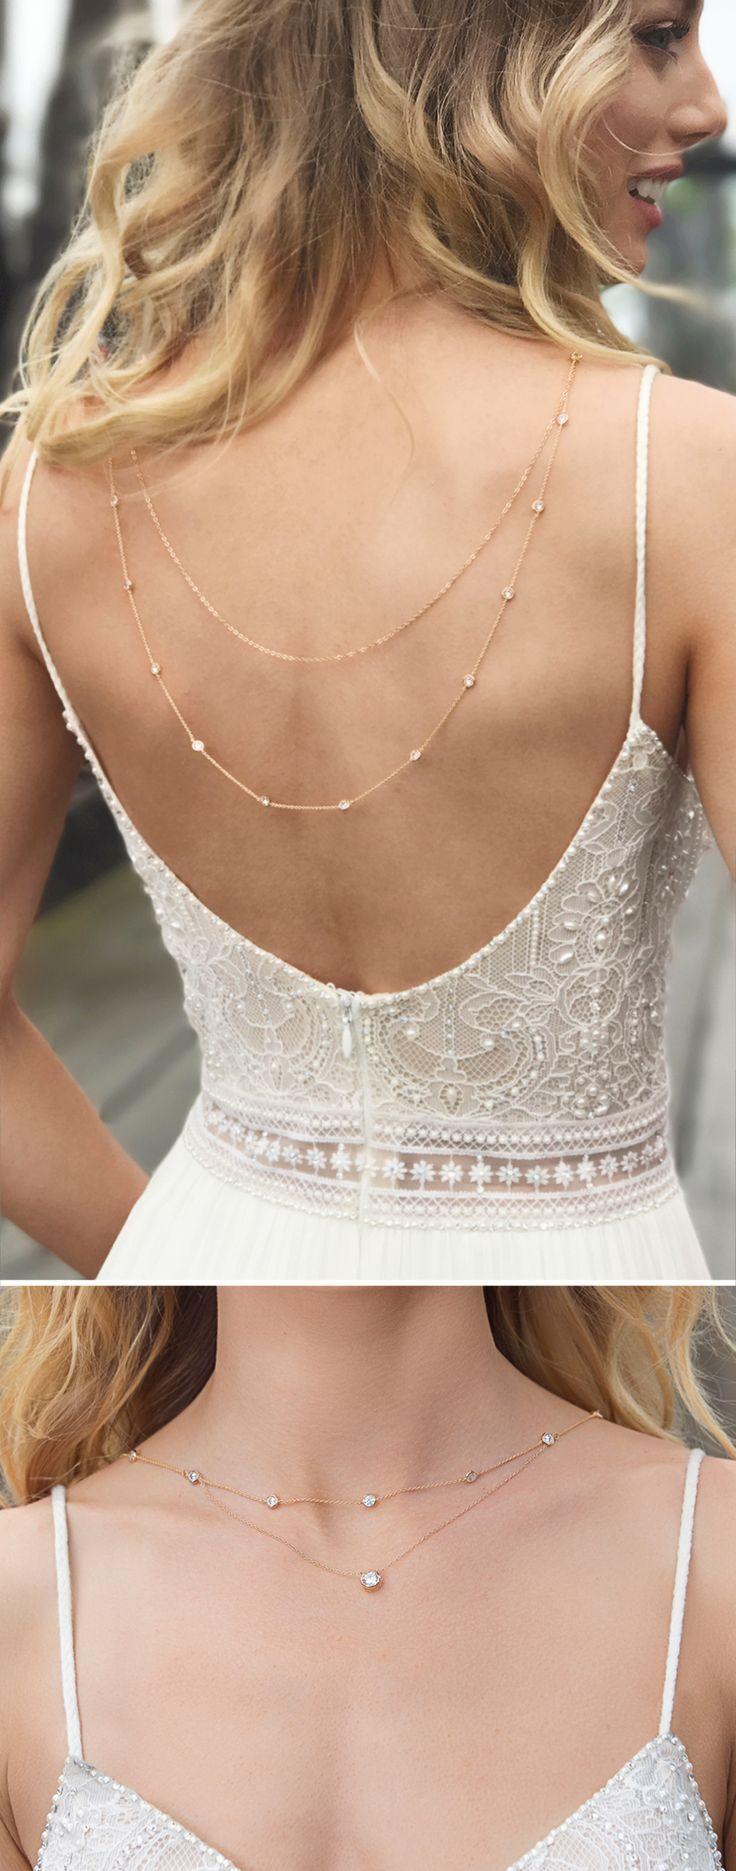 Dakota u crystal back necklace wedding jewelry pinterest